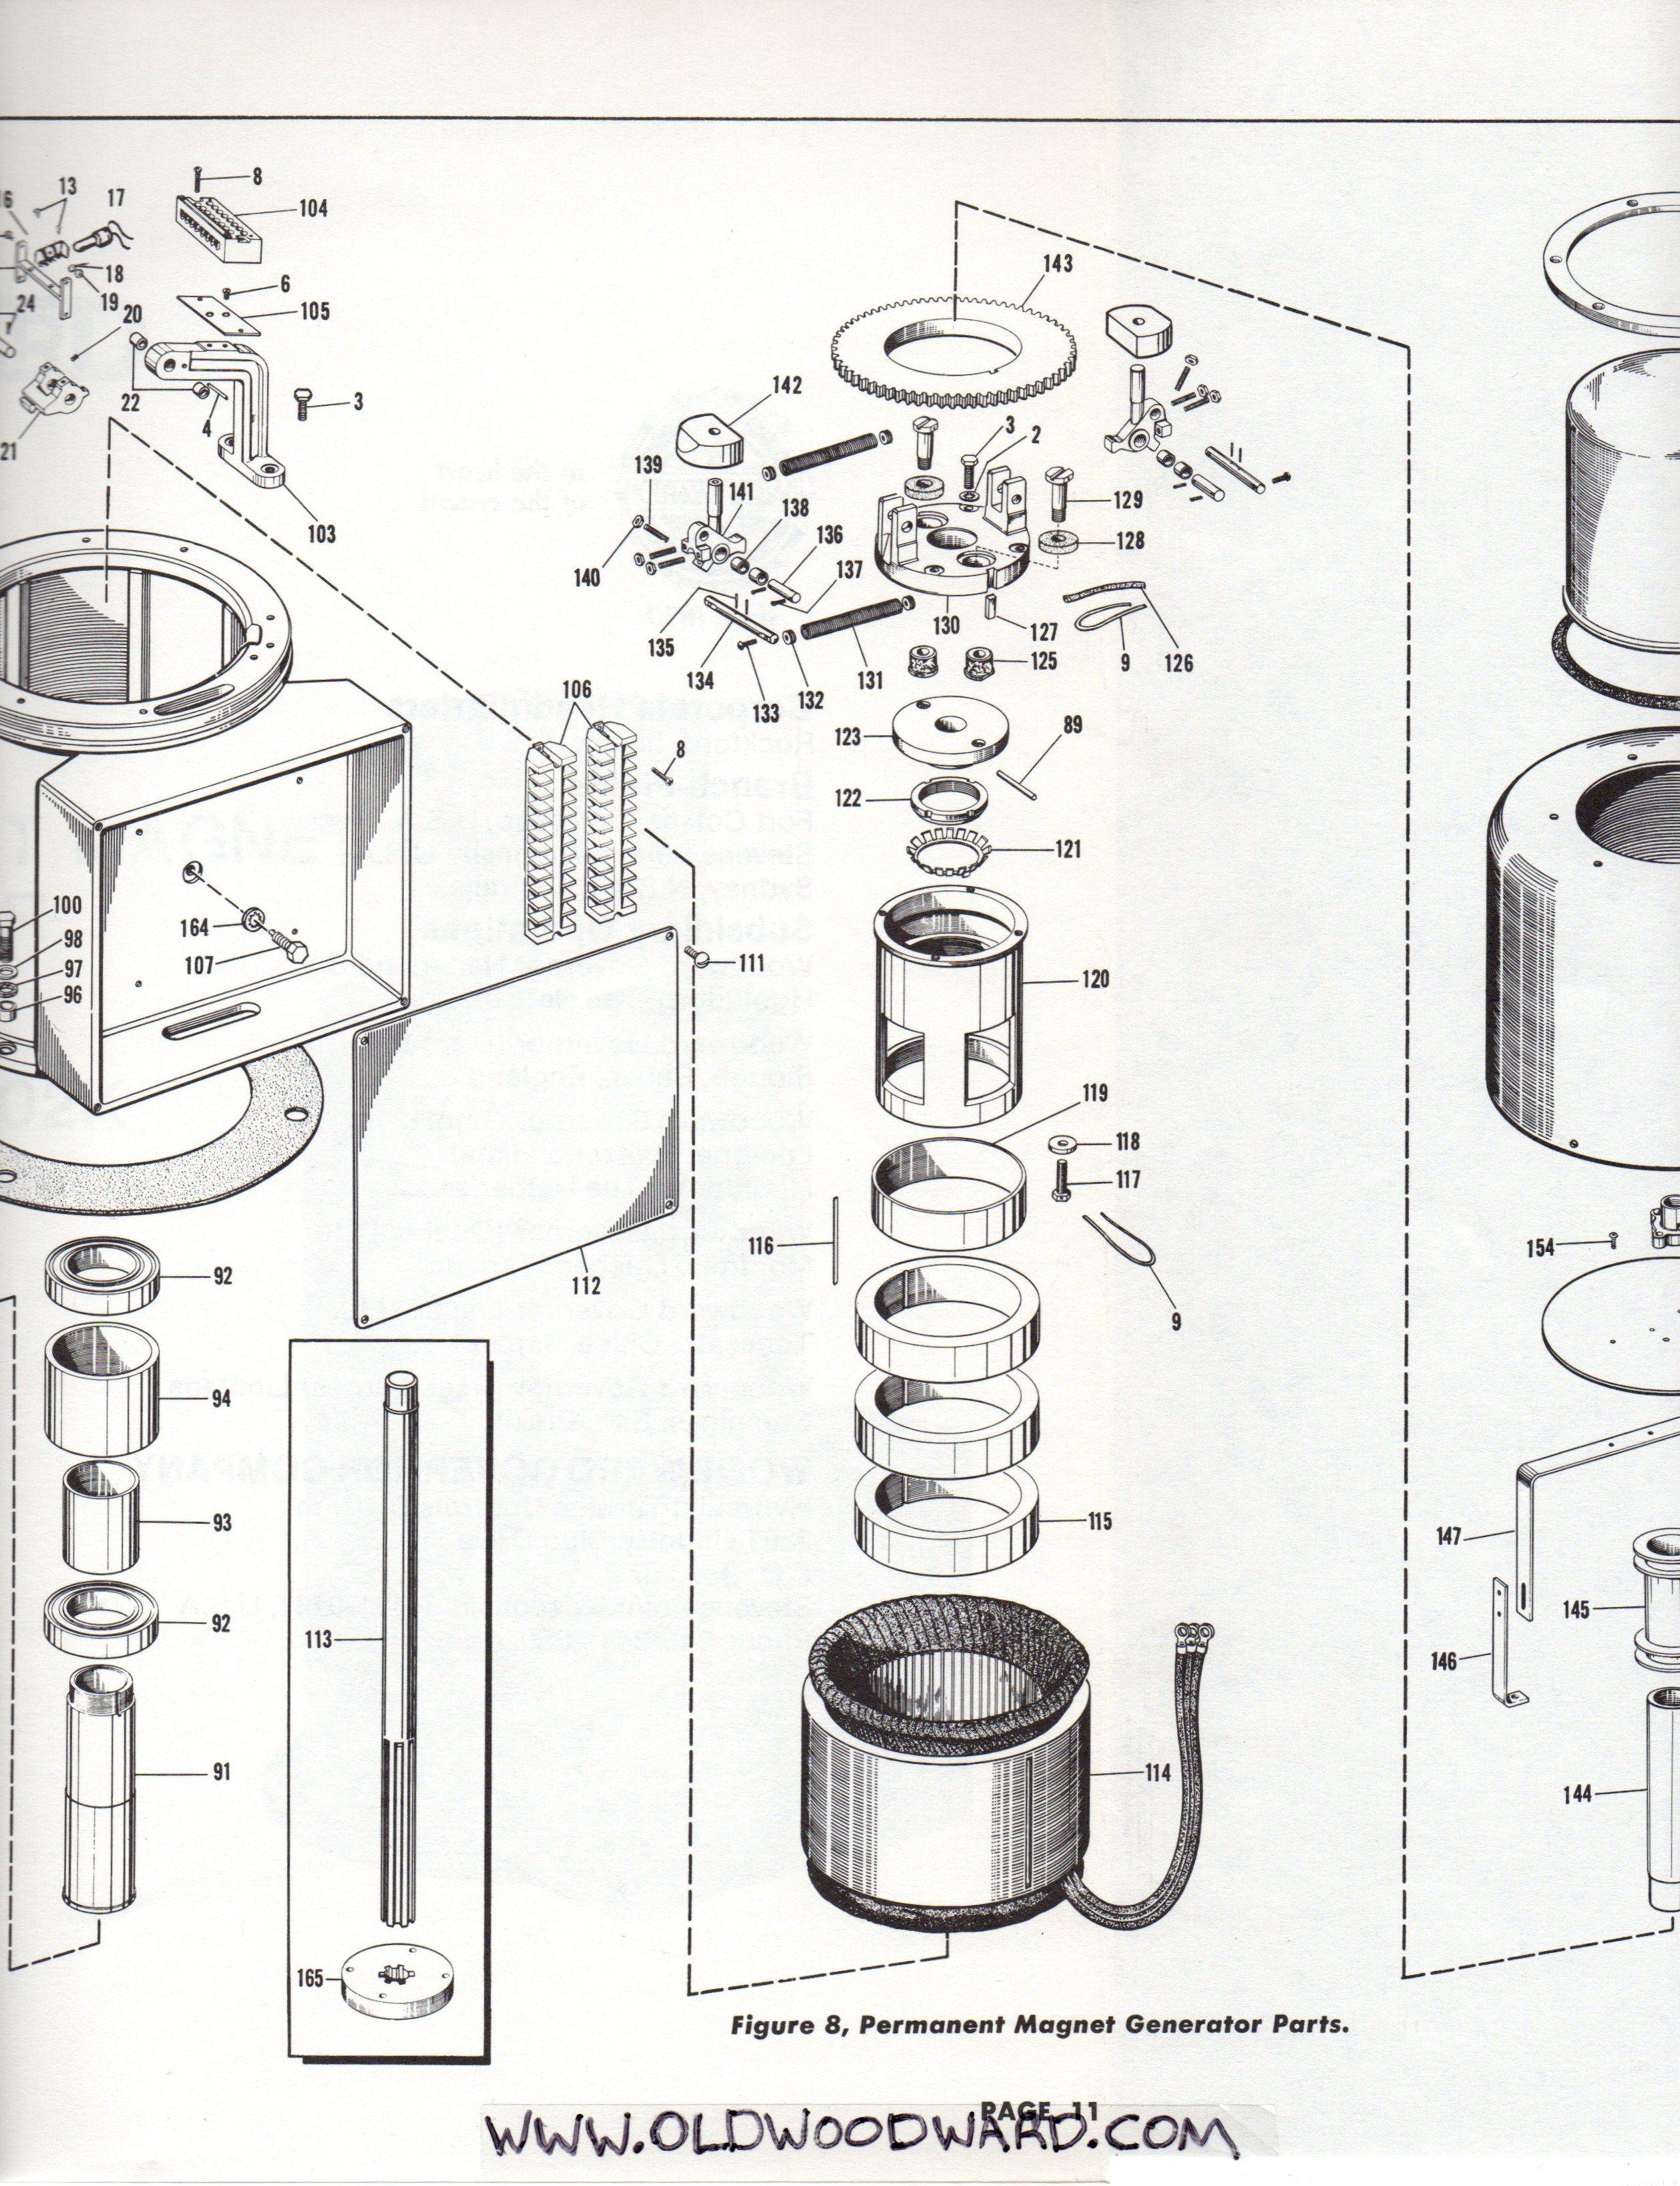 pmg manual 11002k page 11b hydro electric permanent magnet rh pinterest co uk permanent magnet generator parts Permanent Magnet AC Generator